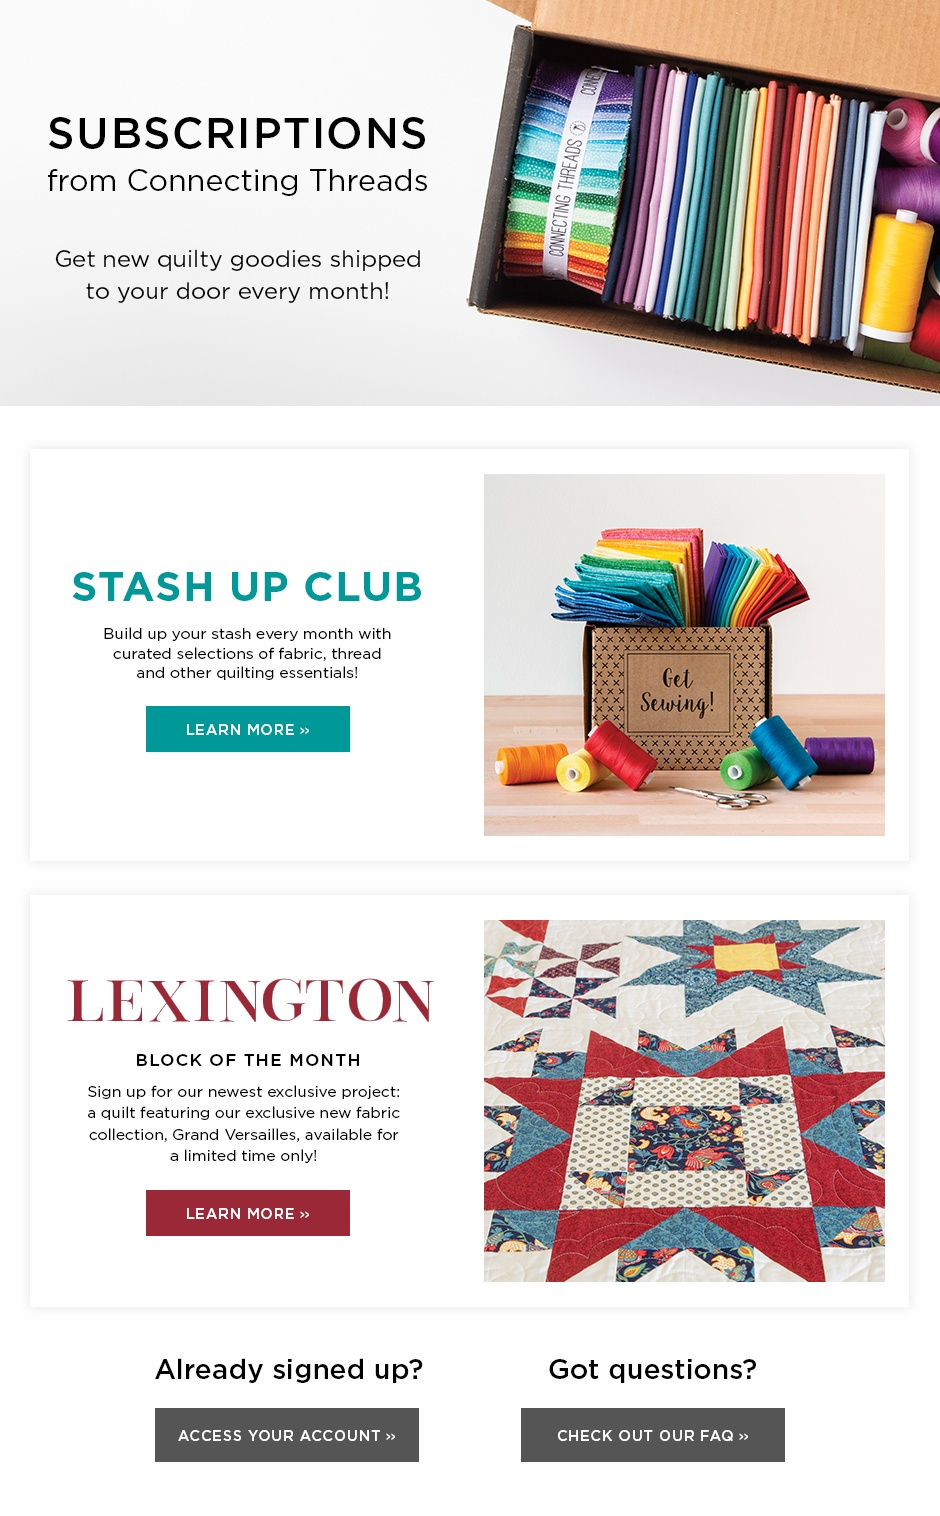 All Subscriptions - Lexington